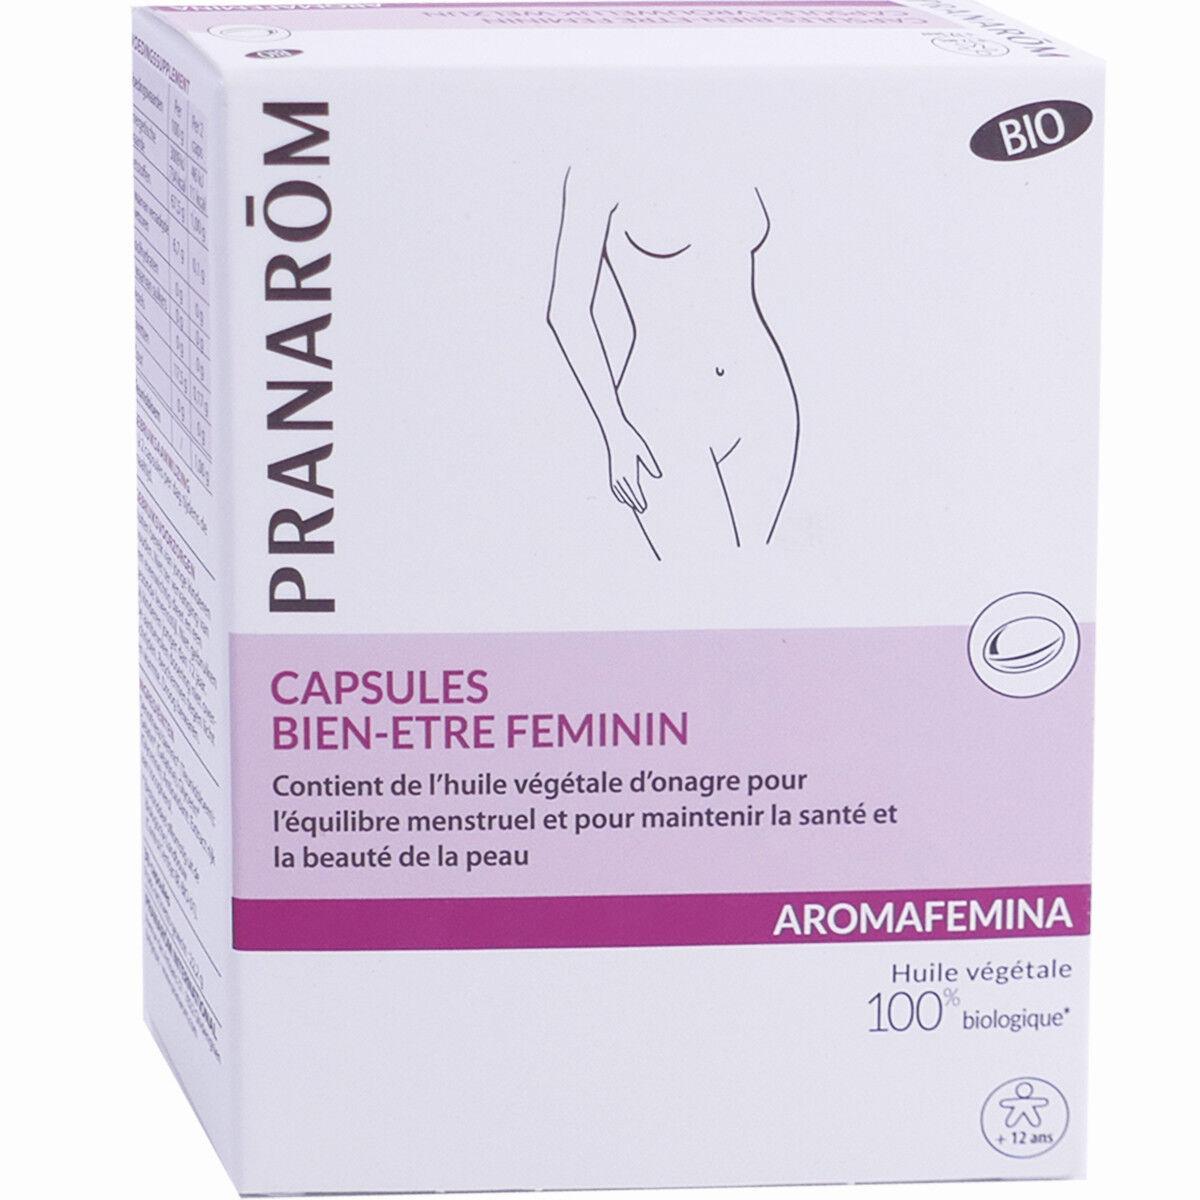 Pranarom 30 capsules bien etre feminin aromafemina